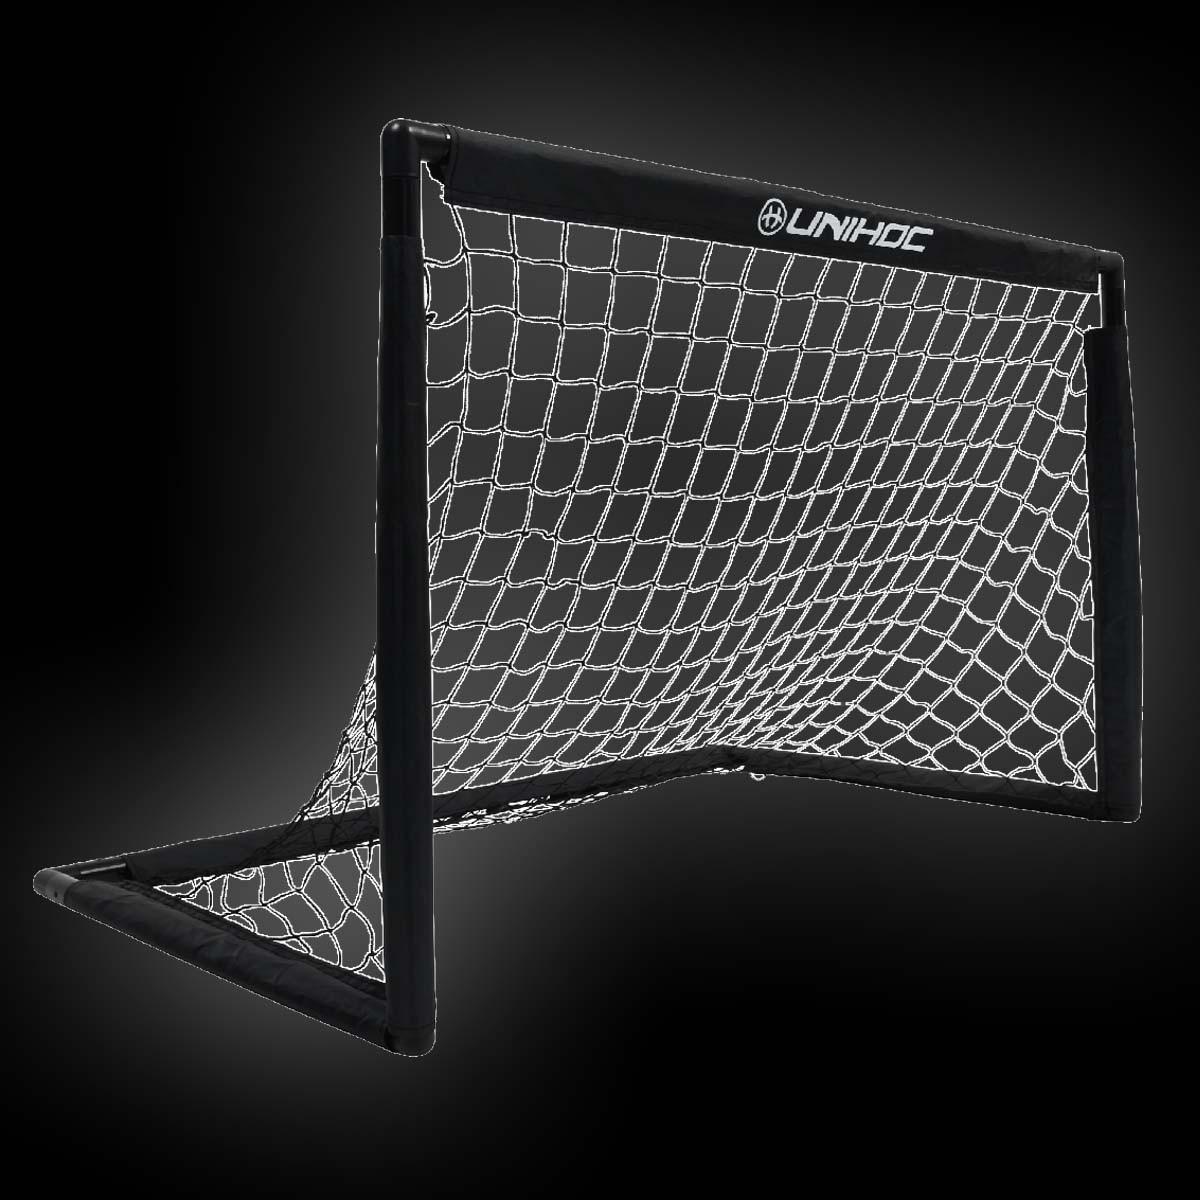 unihoc EasyUp Goal (90x60cm)